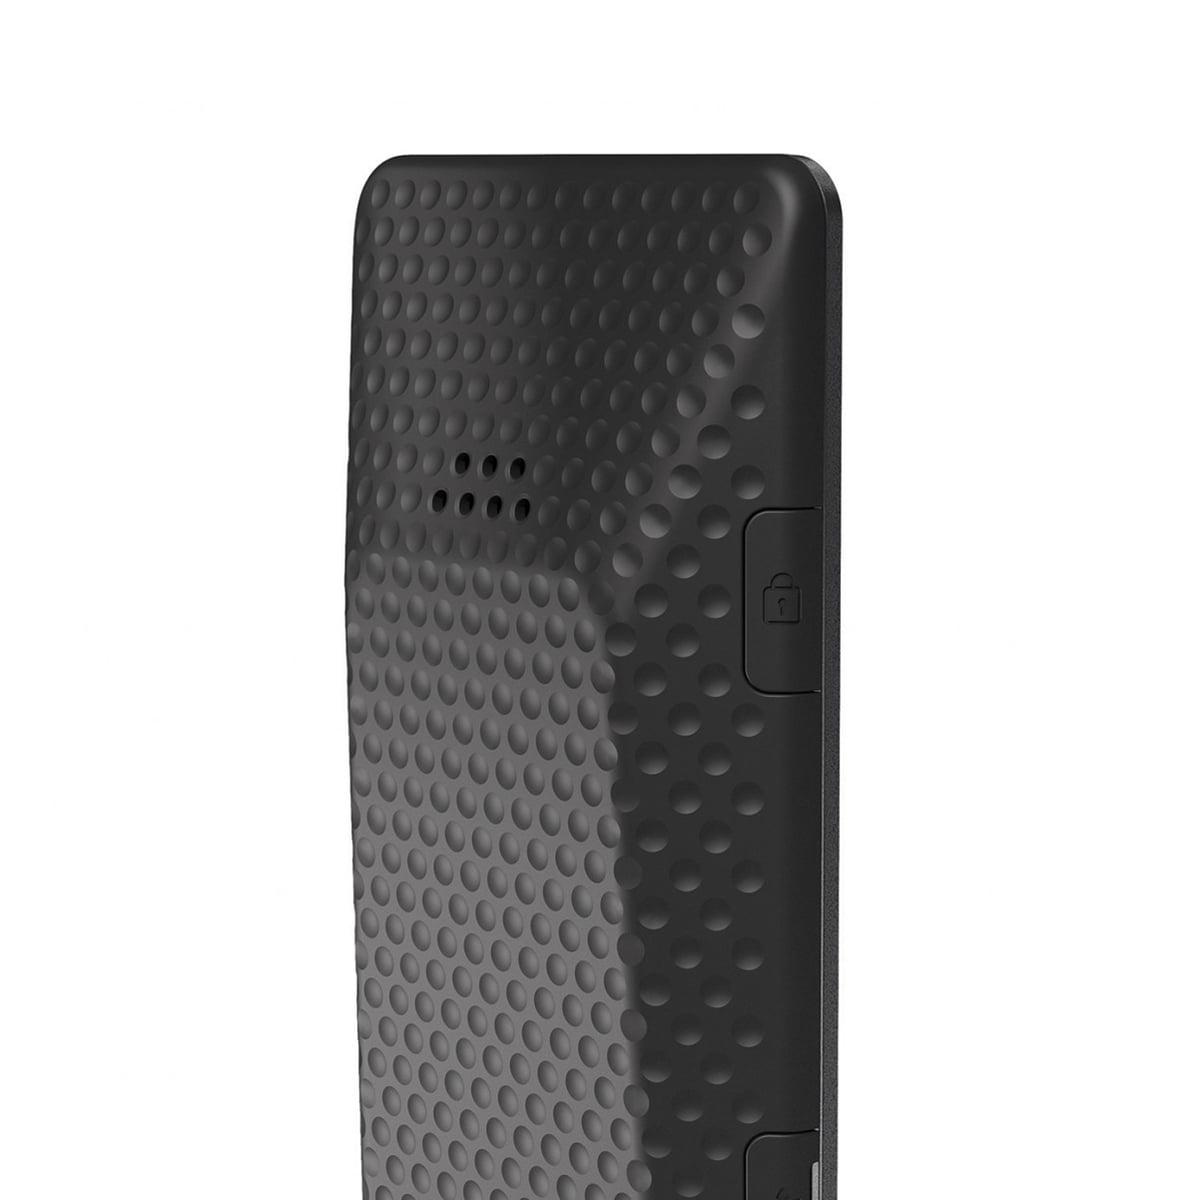 mp01 mobile phone: seniorentelefon - Wohnideen In Beigeweiss